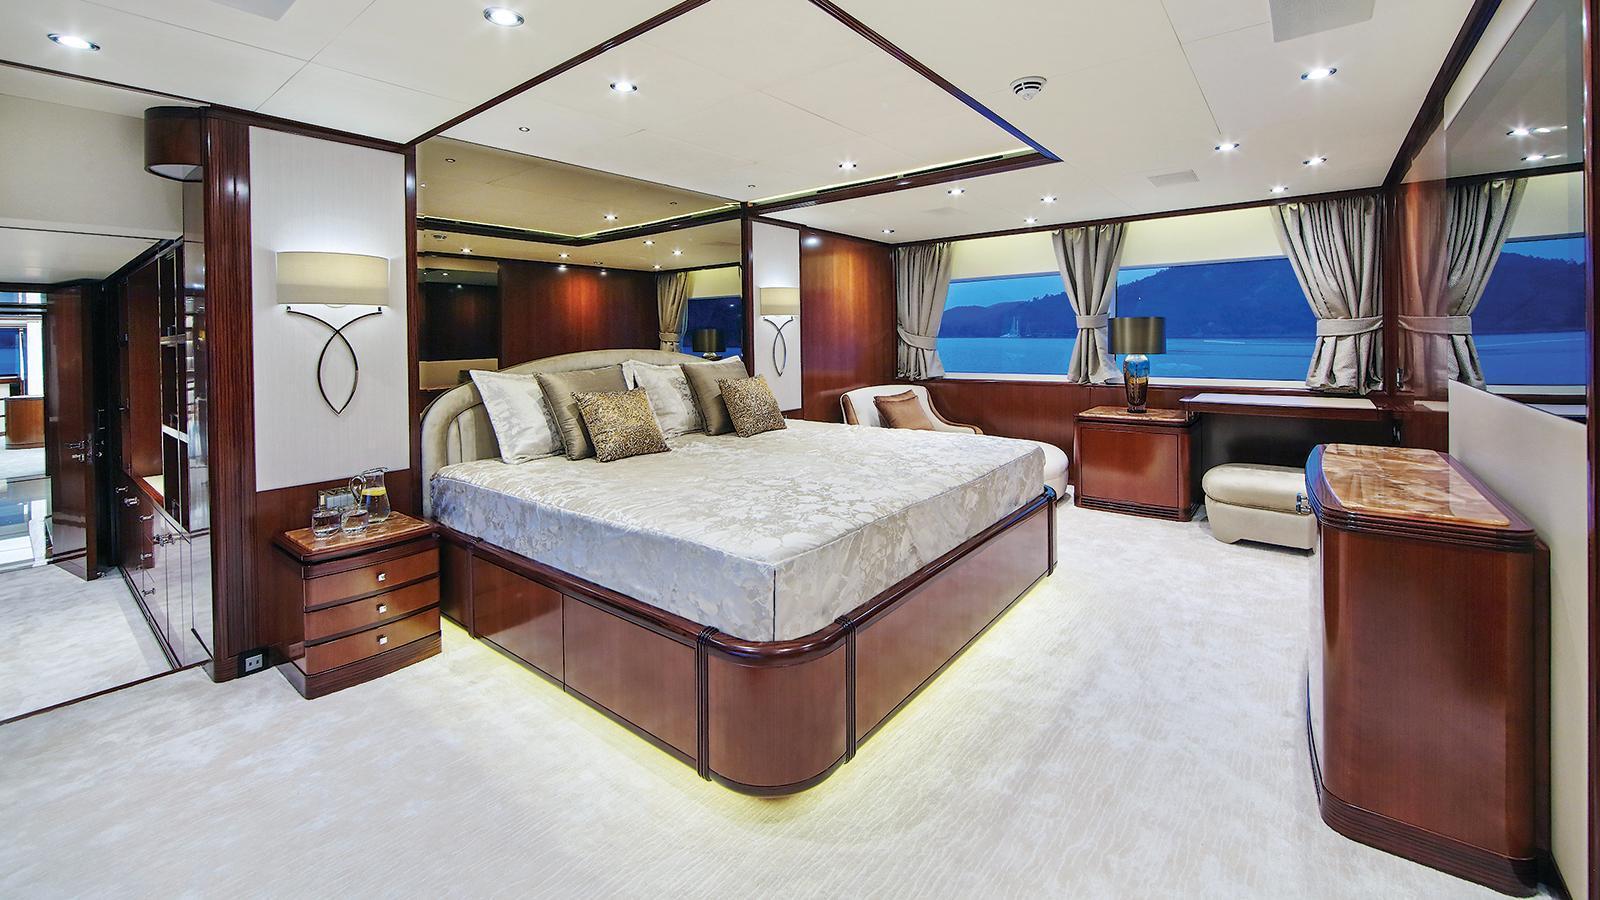 vica-motor-yacht-benetti-2015-50m-state-room